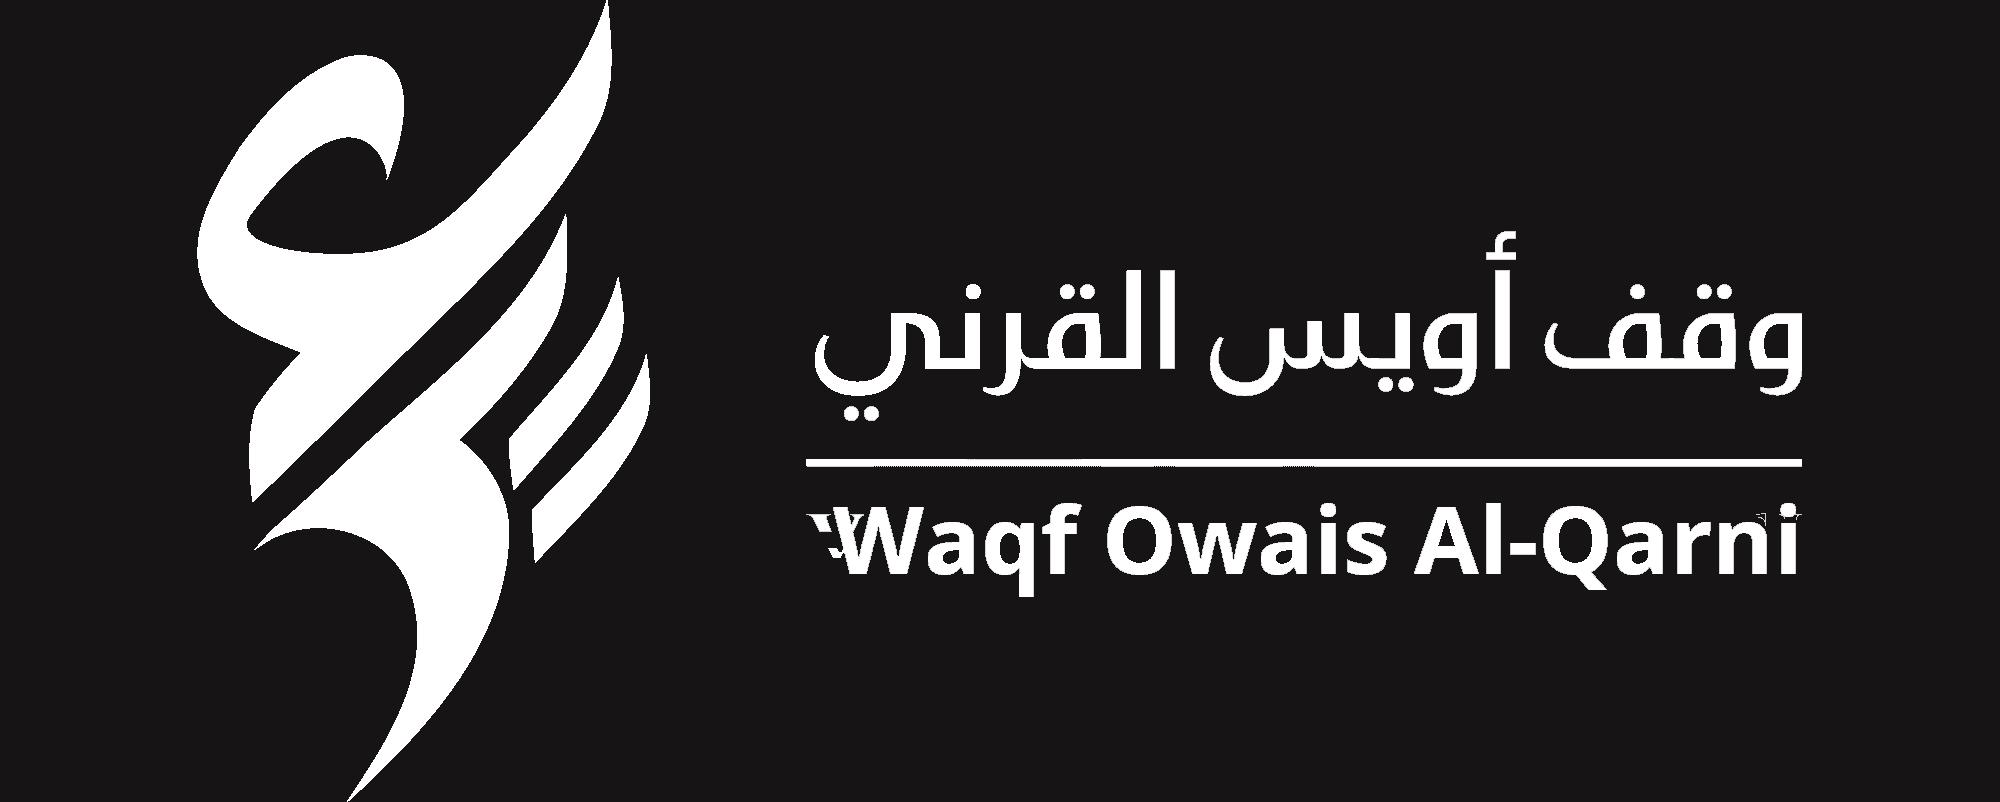 Wqlogo